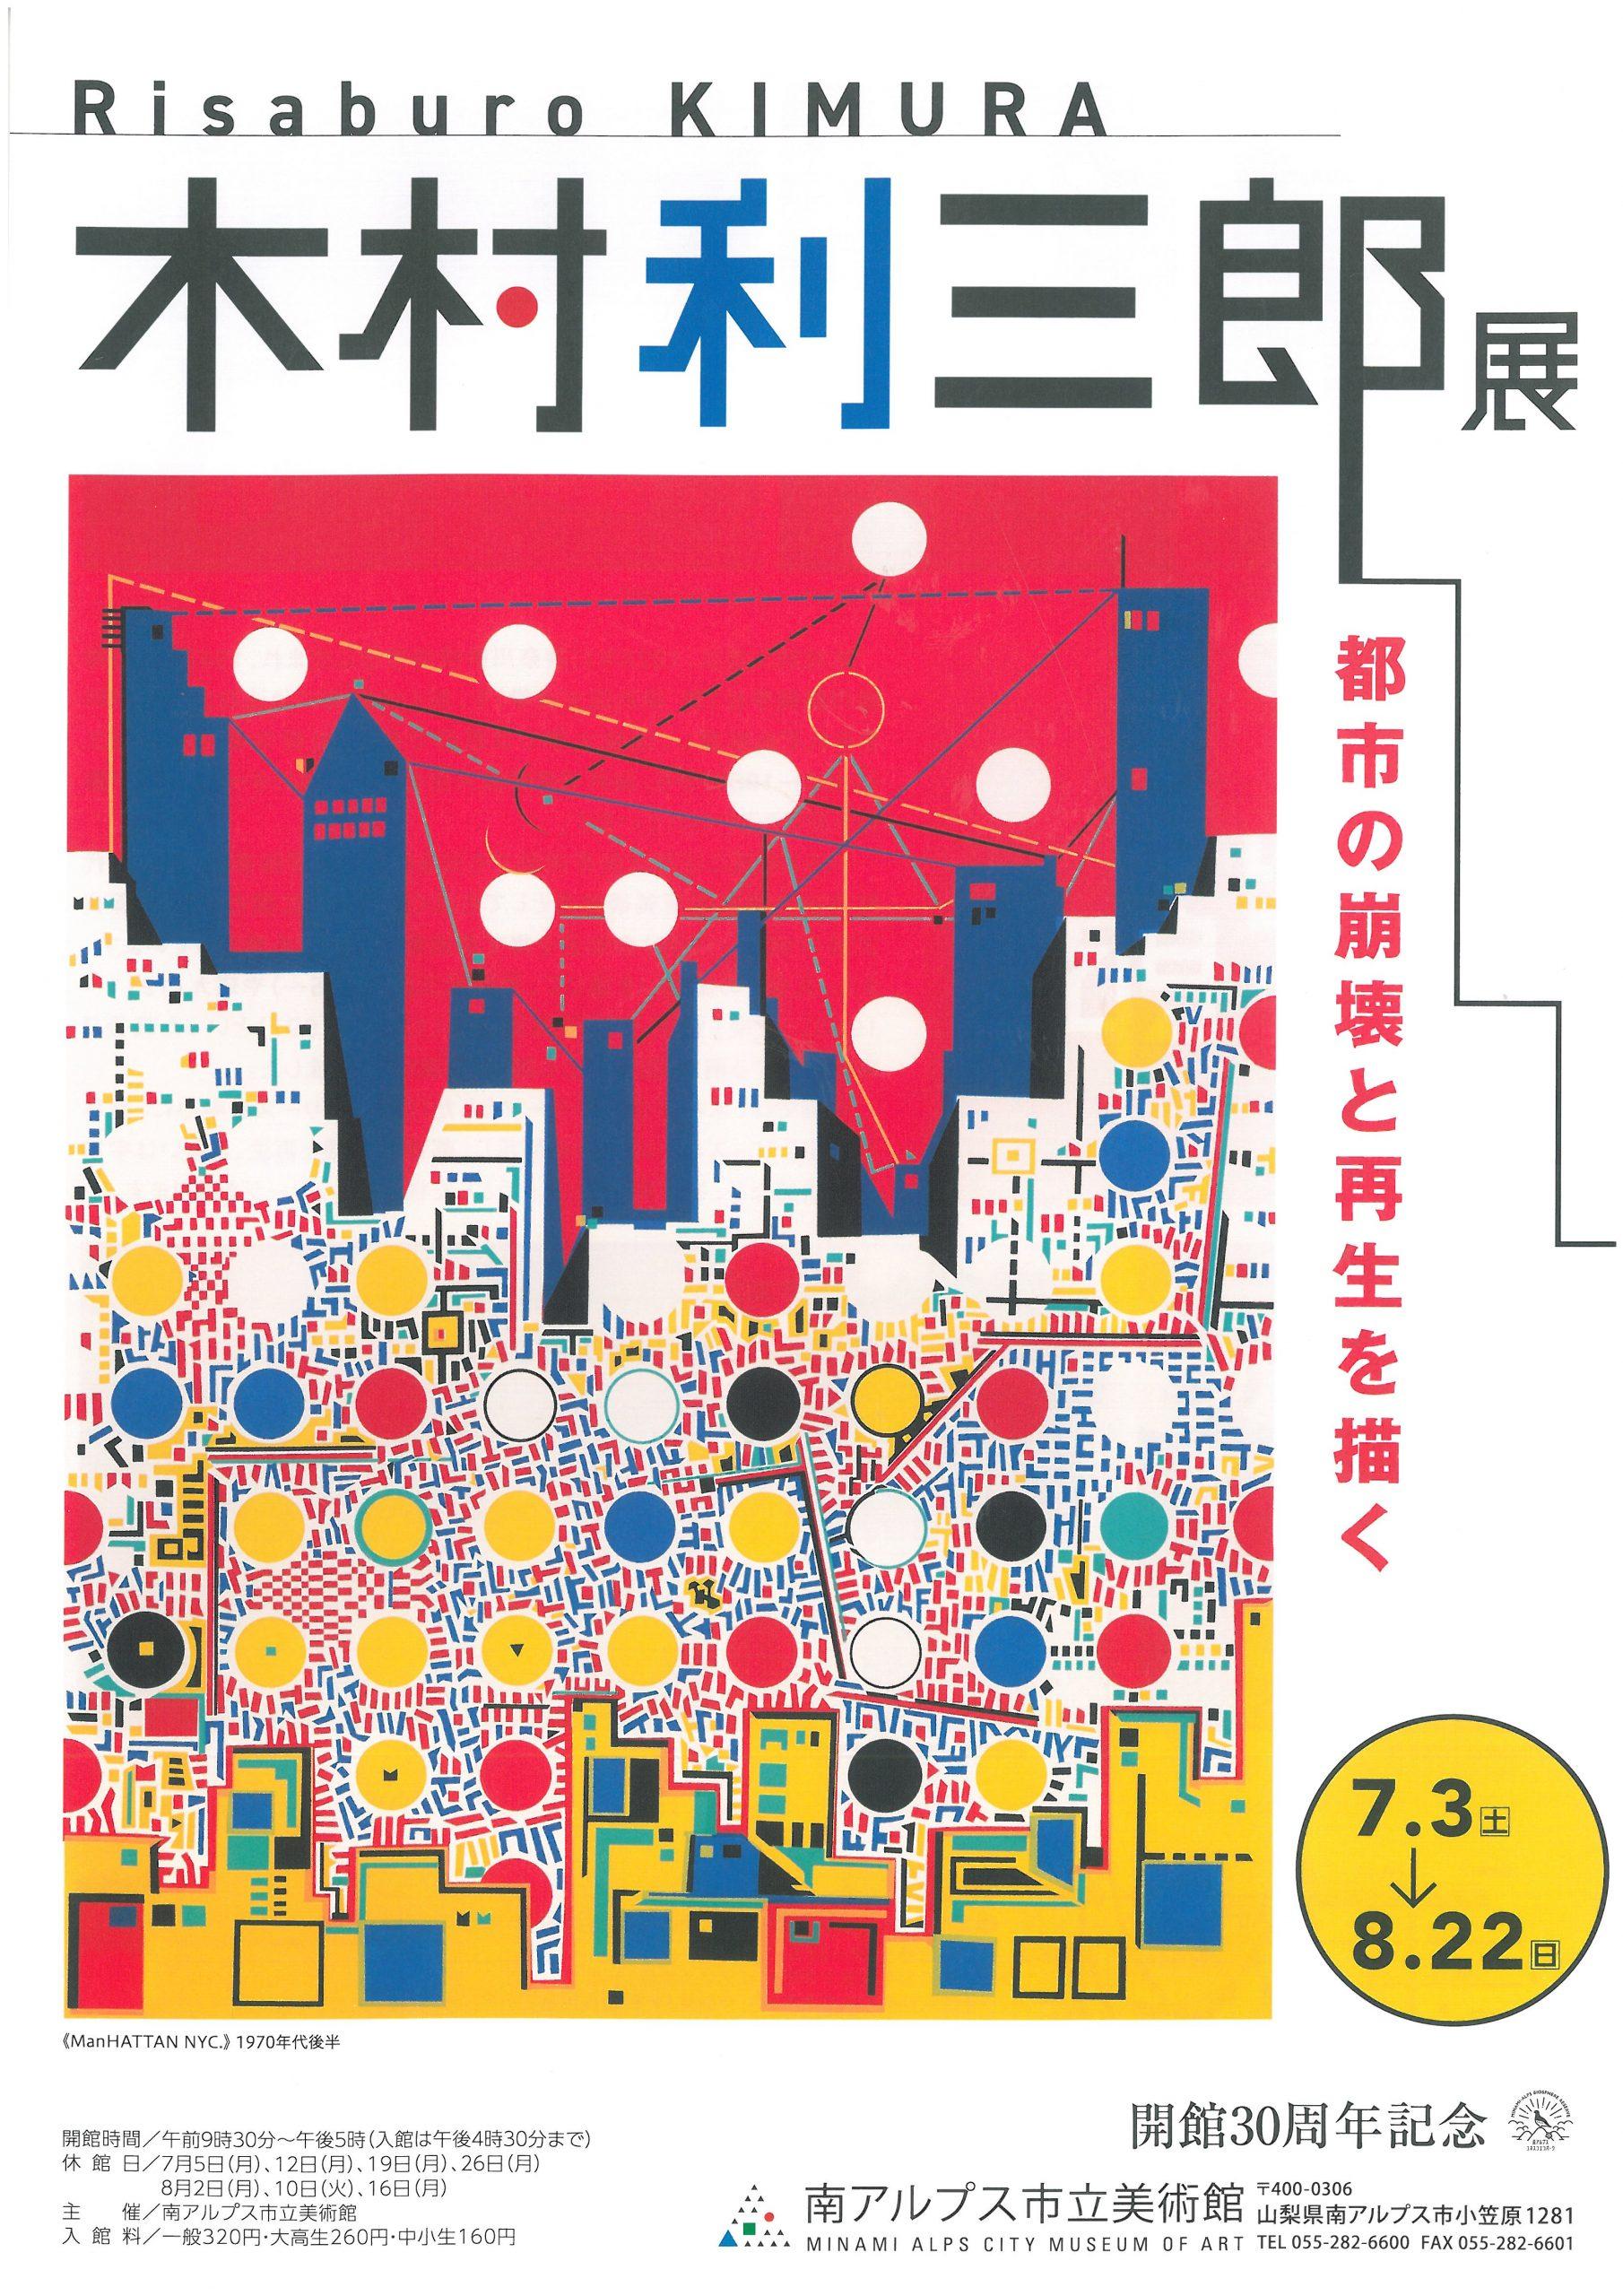 【木村利三郎 展】南アルプス市立美術館